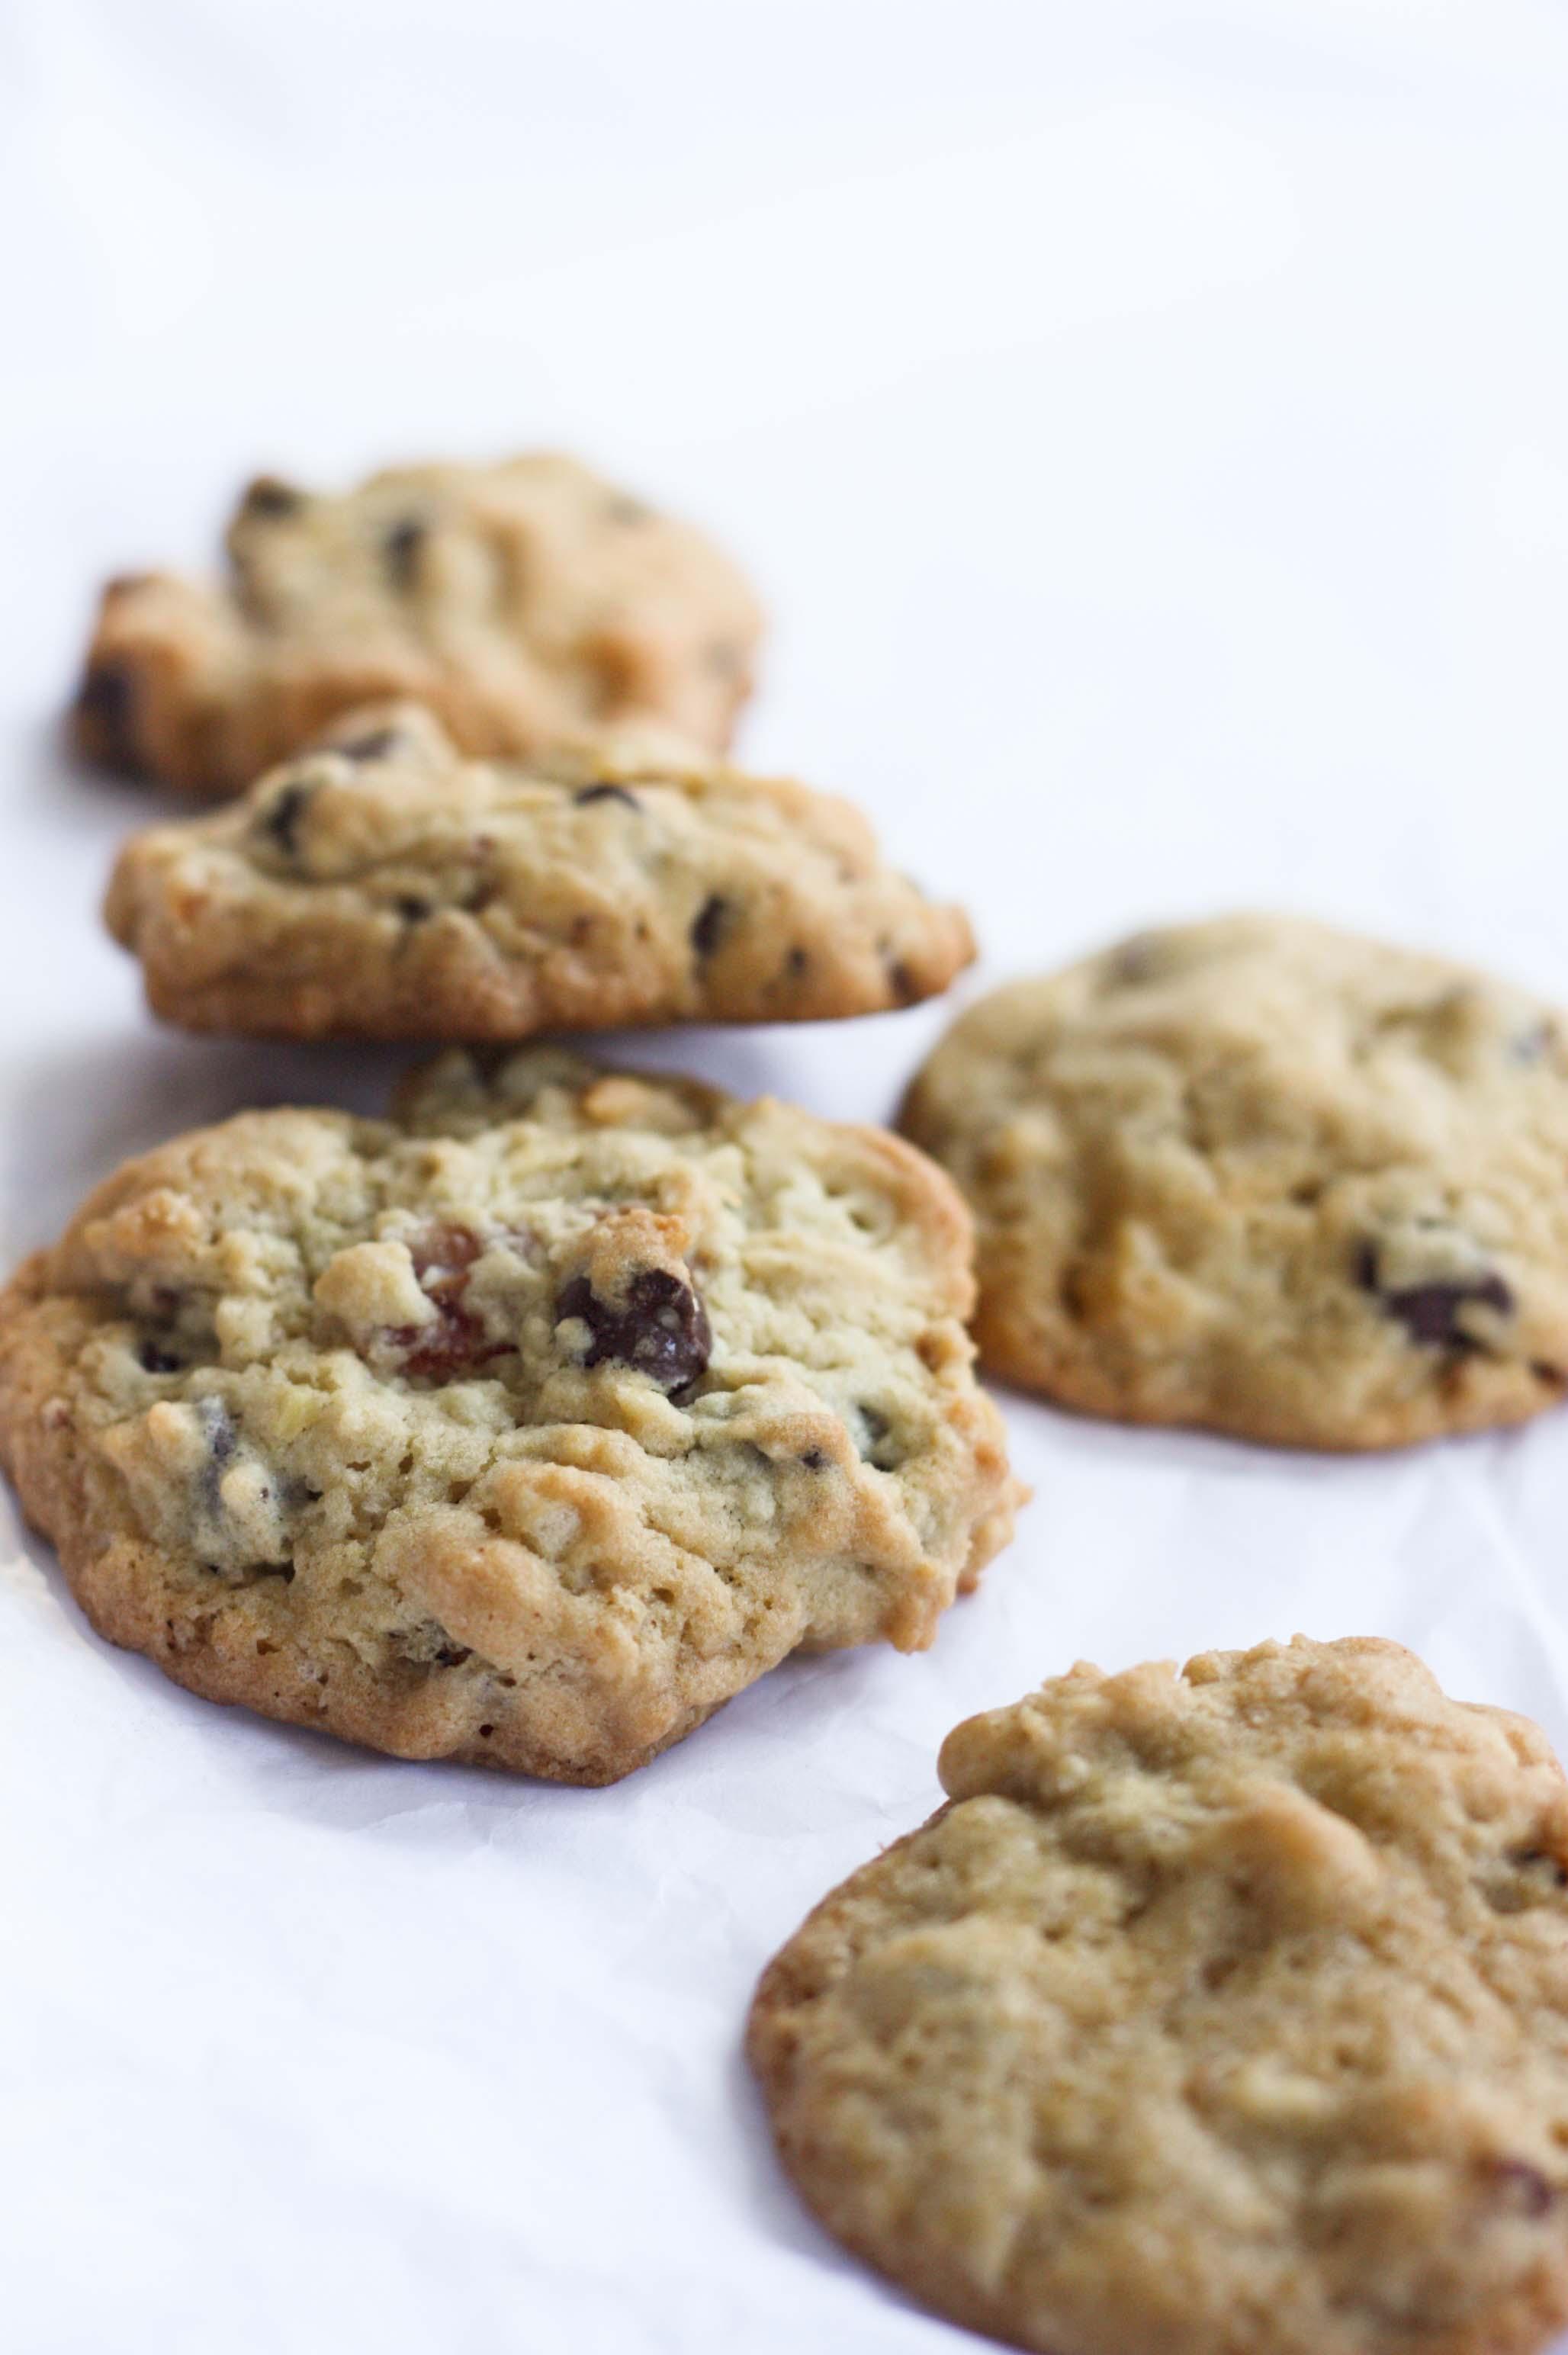 Banana Bacon Chocolate Chip Cookies | Foodologie